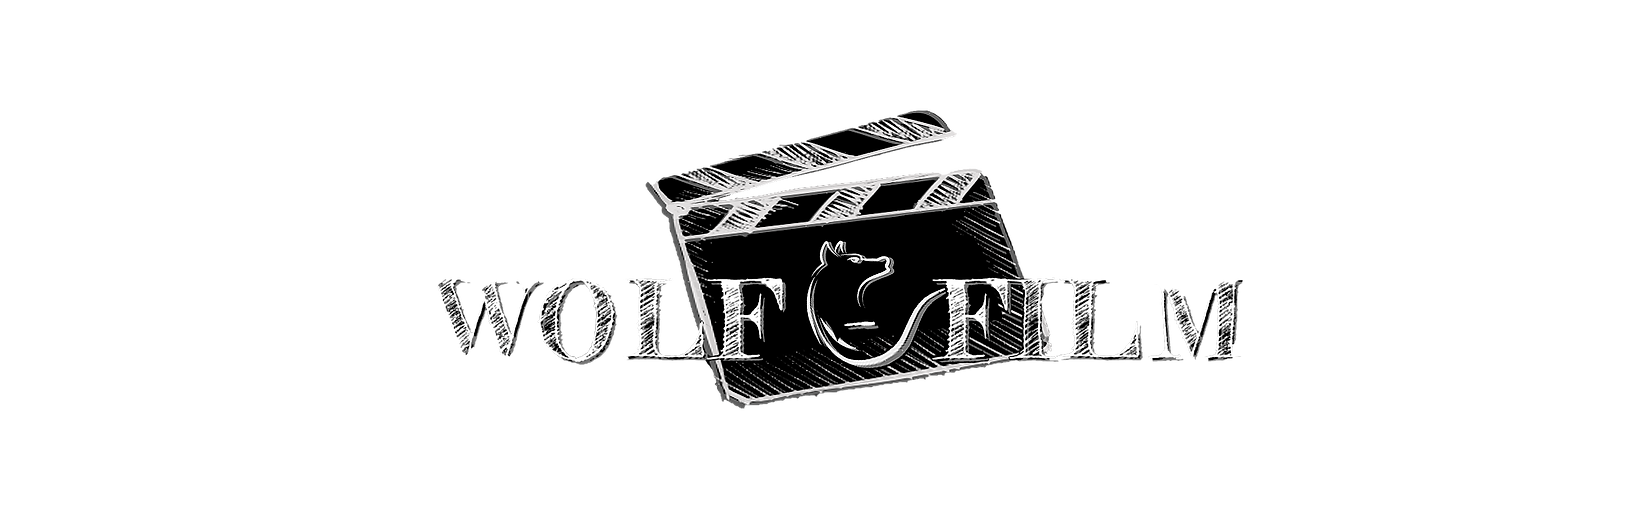 wolf film klappe bearbeitet.png